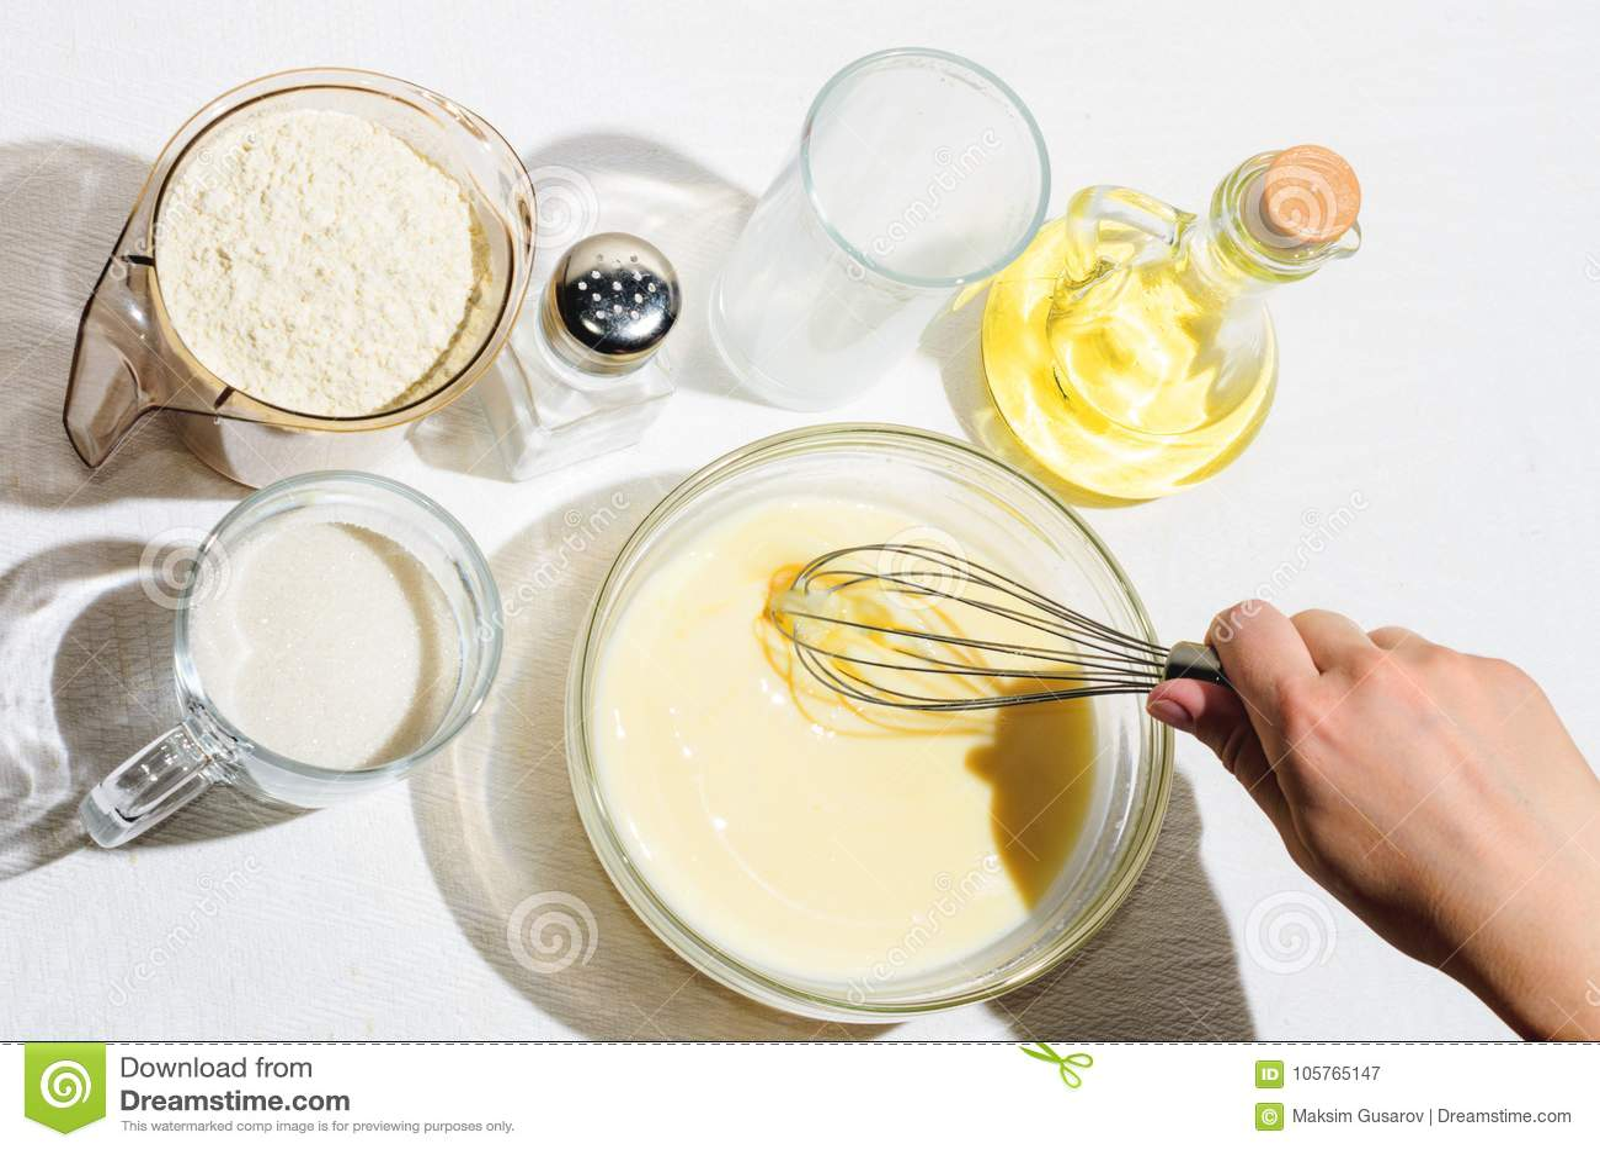 Kochen von Pfannkuchen, Blini